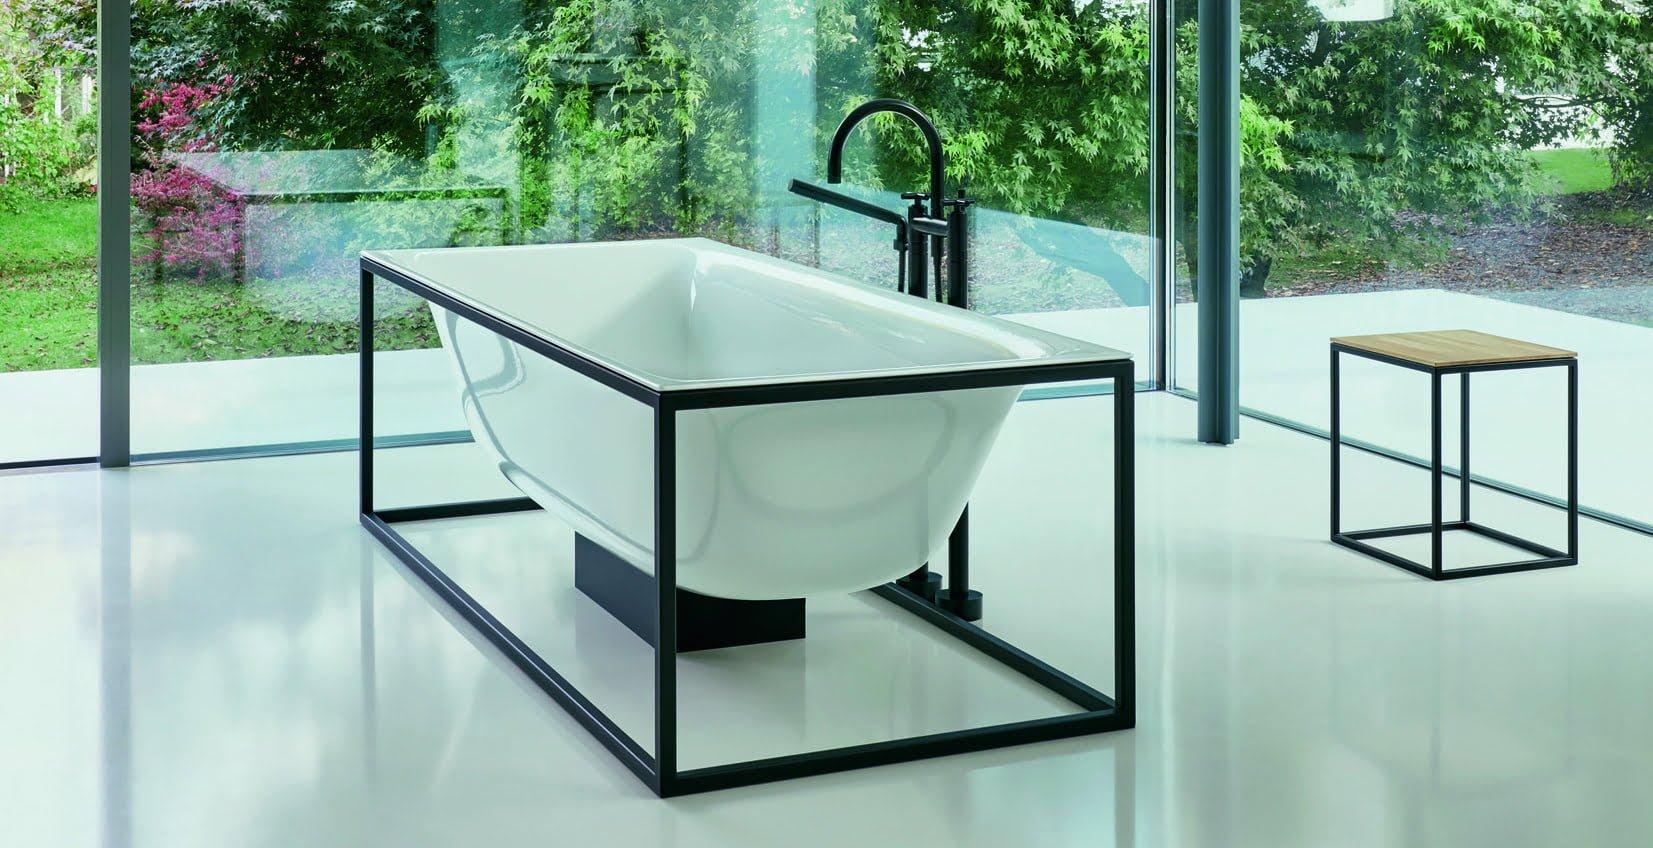 BetteLux Shape bath and stool - SPACE   International Hotel Design